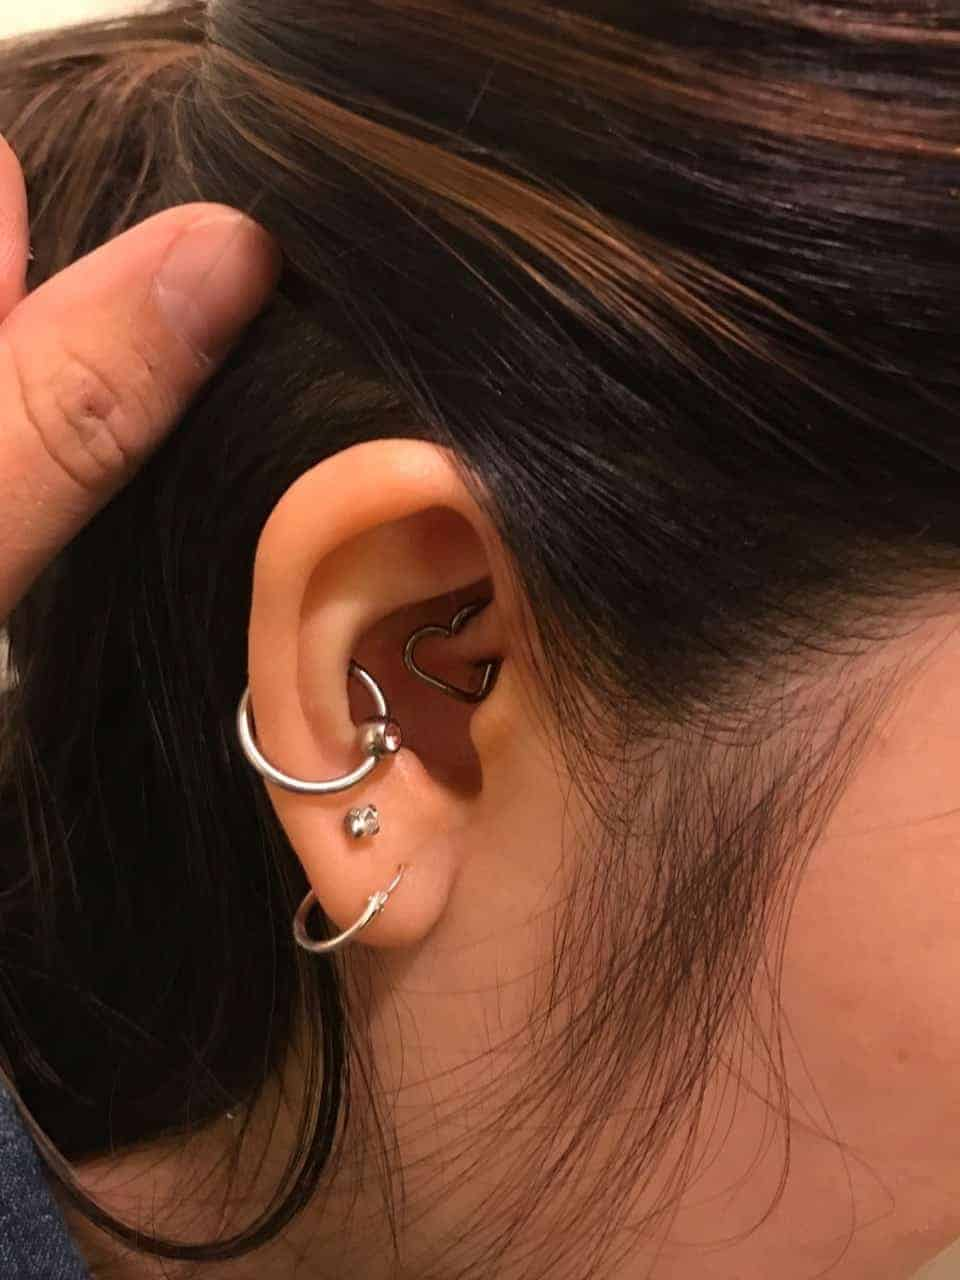 Types of ear piercings for men